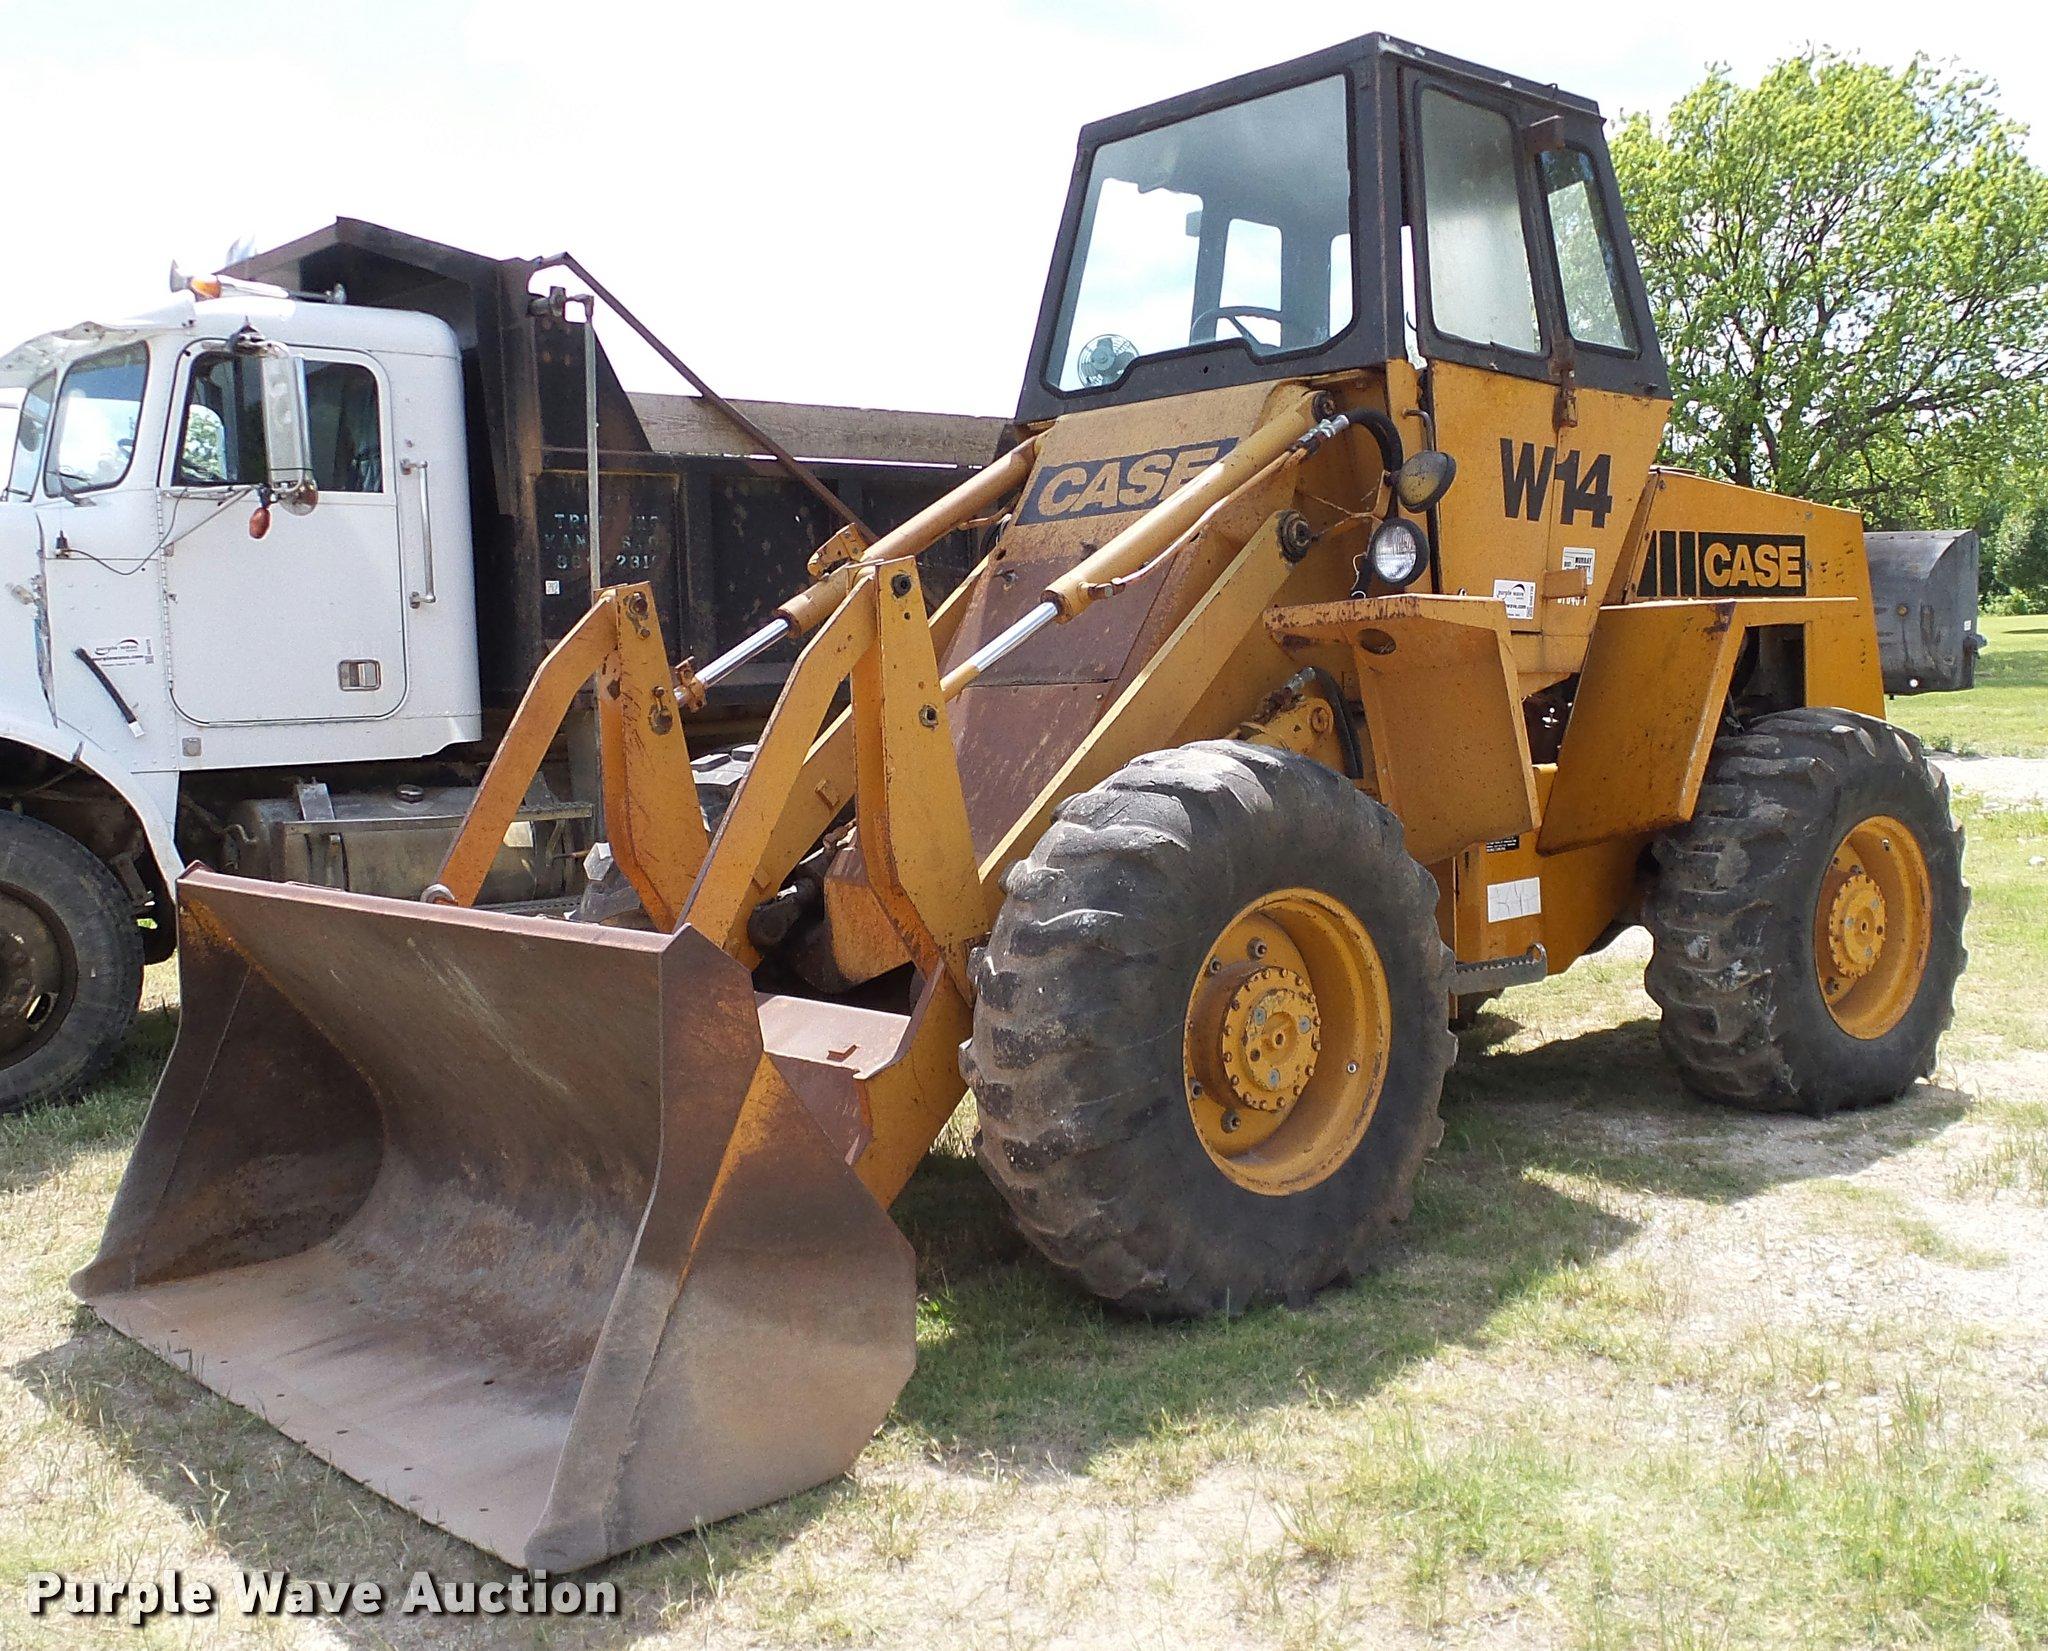 1980 Case W14 wheel loader | Item DA6130 | SOLD! June 6 Gove...